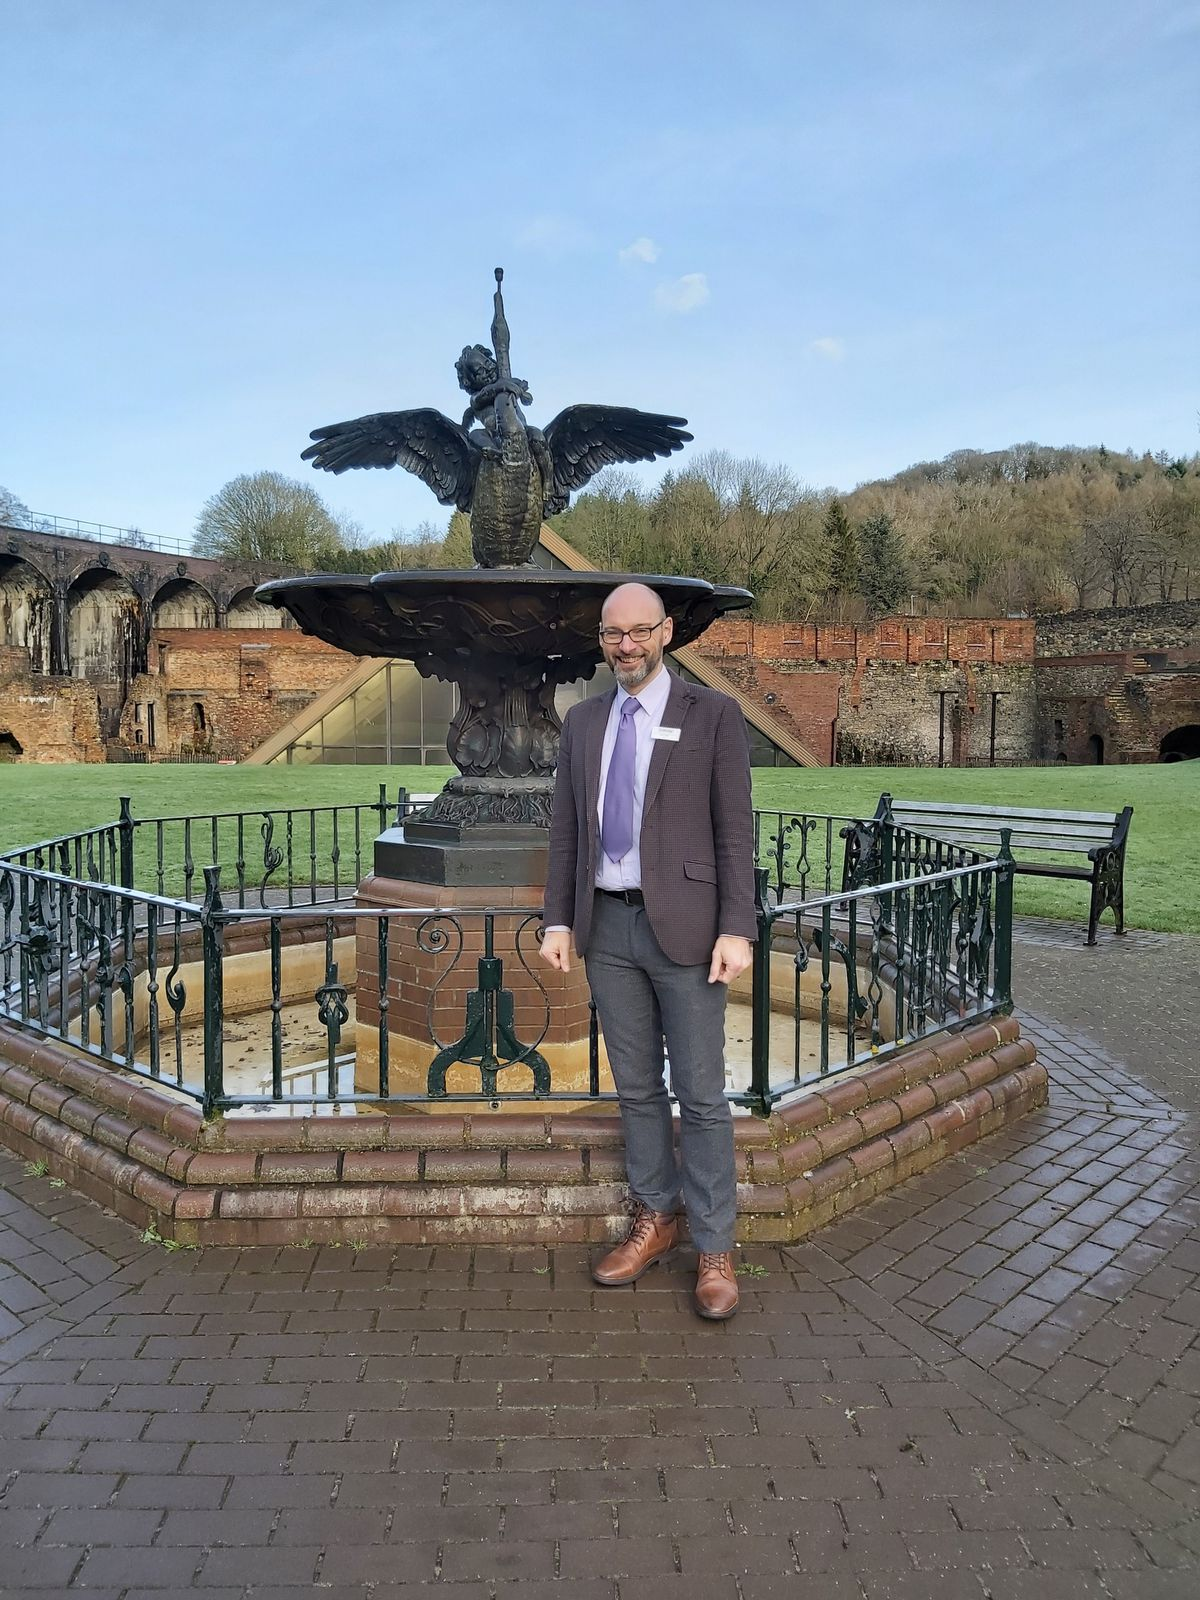 Nick Ralls, chief executive of Ironbridge Gorge Museums